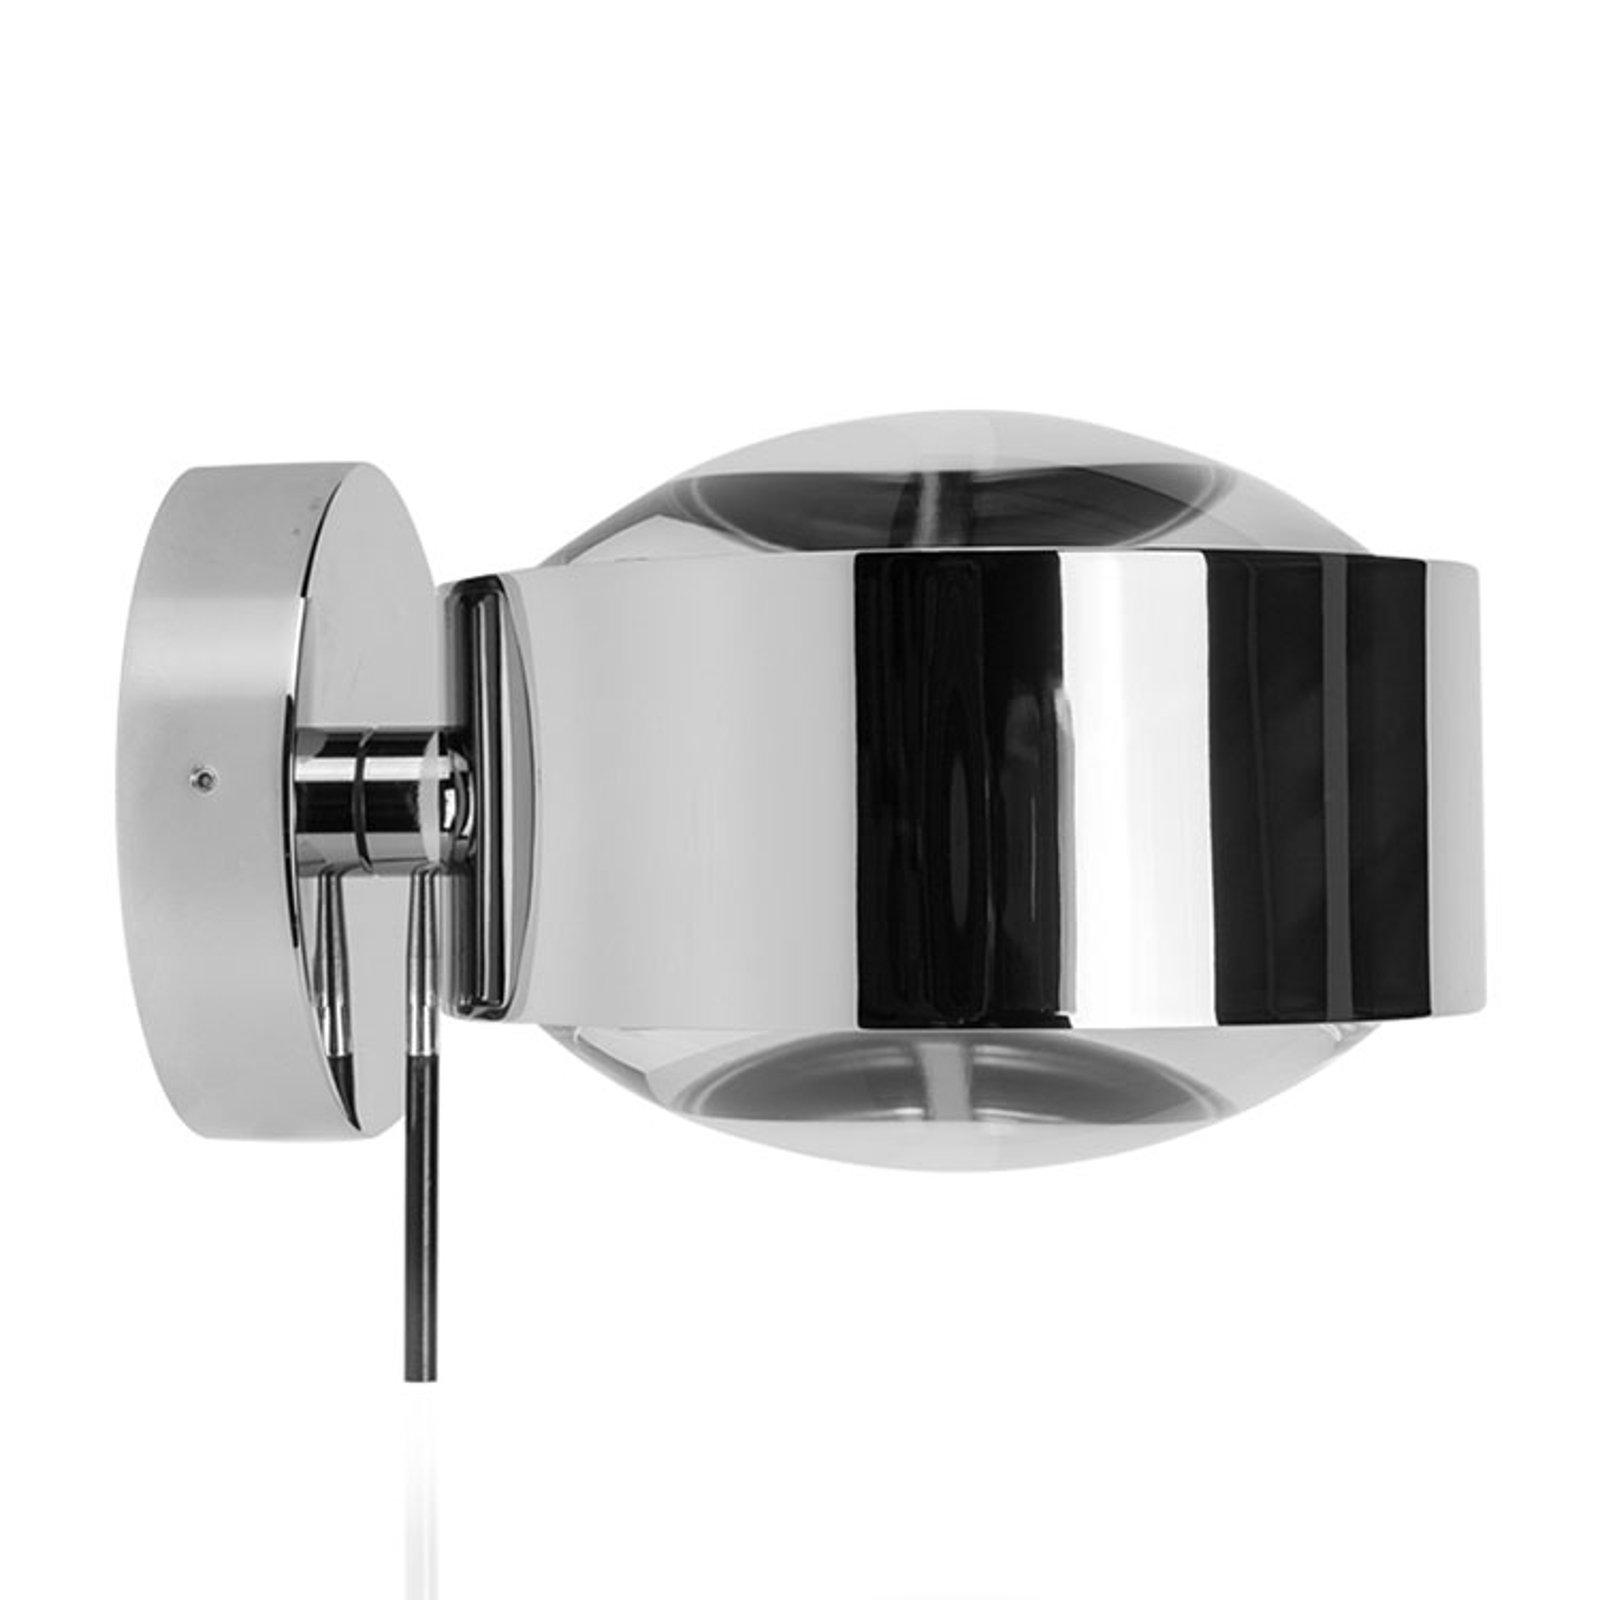 LED-vegglampe Puk Maxx Wall+, krom